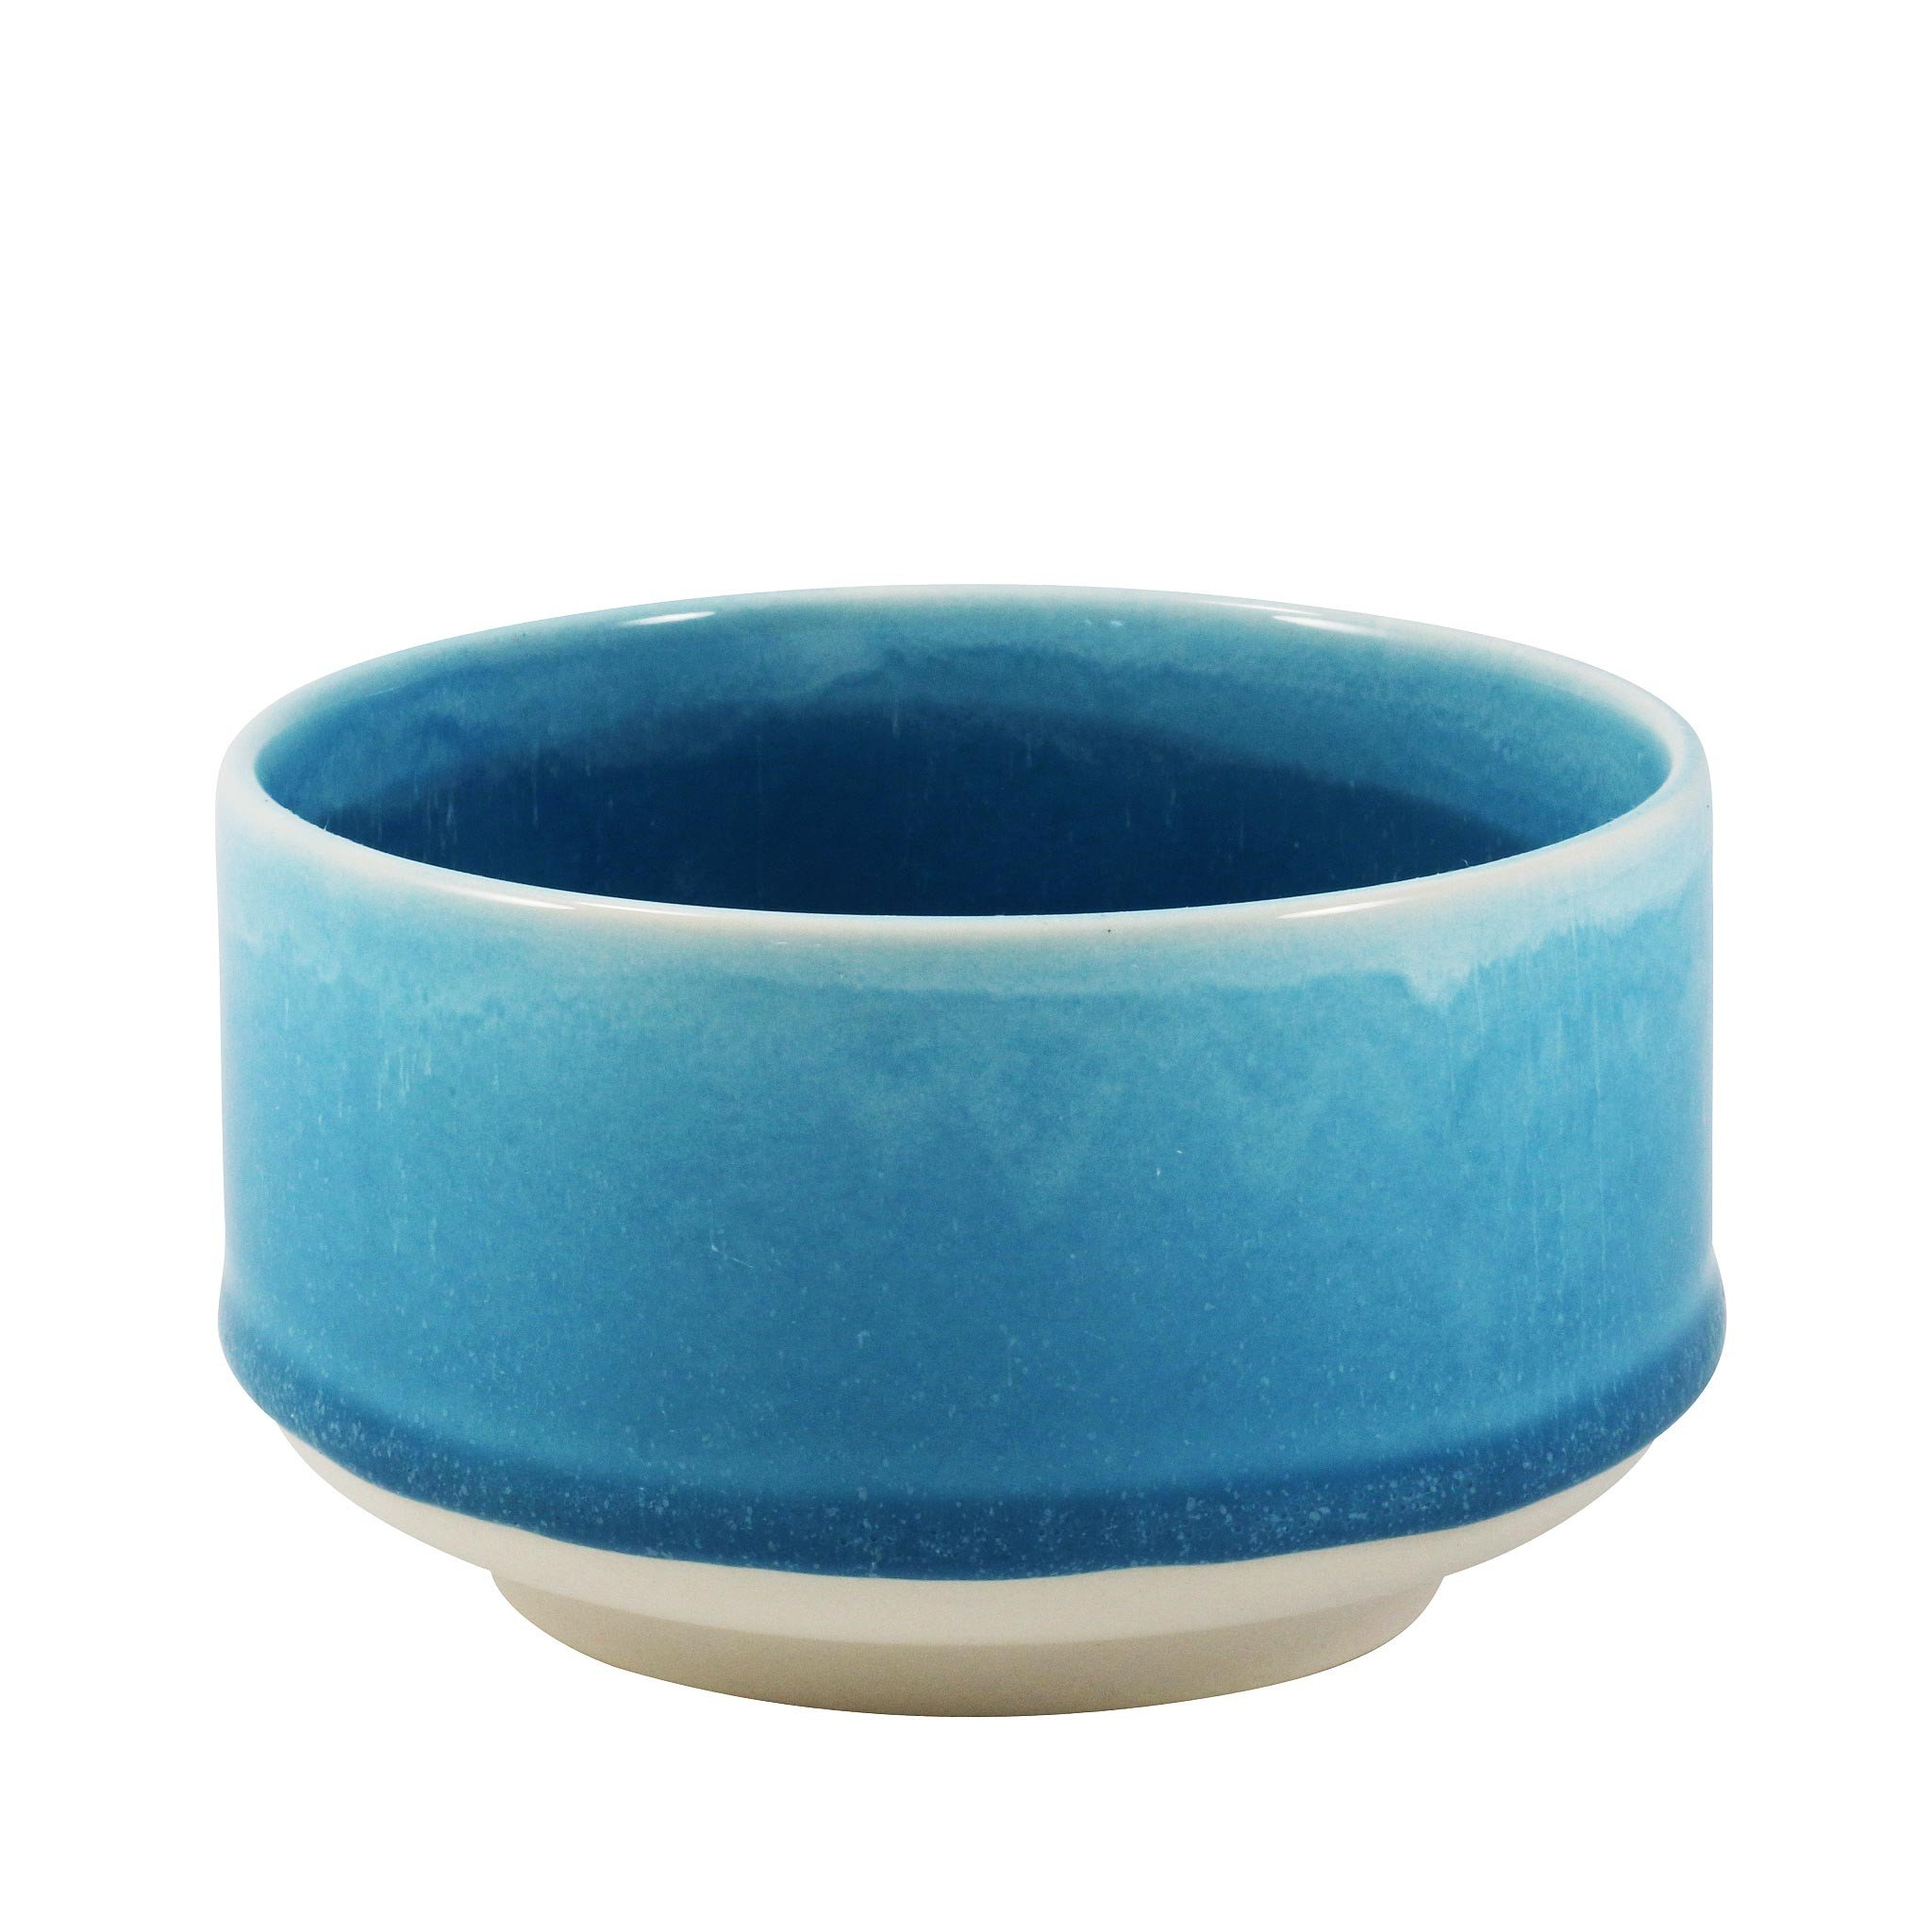 STUDIO ARHØJ - Munch Bowl, Blue Sea